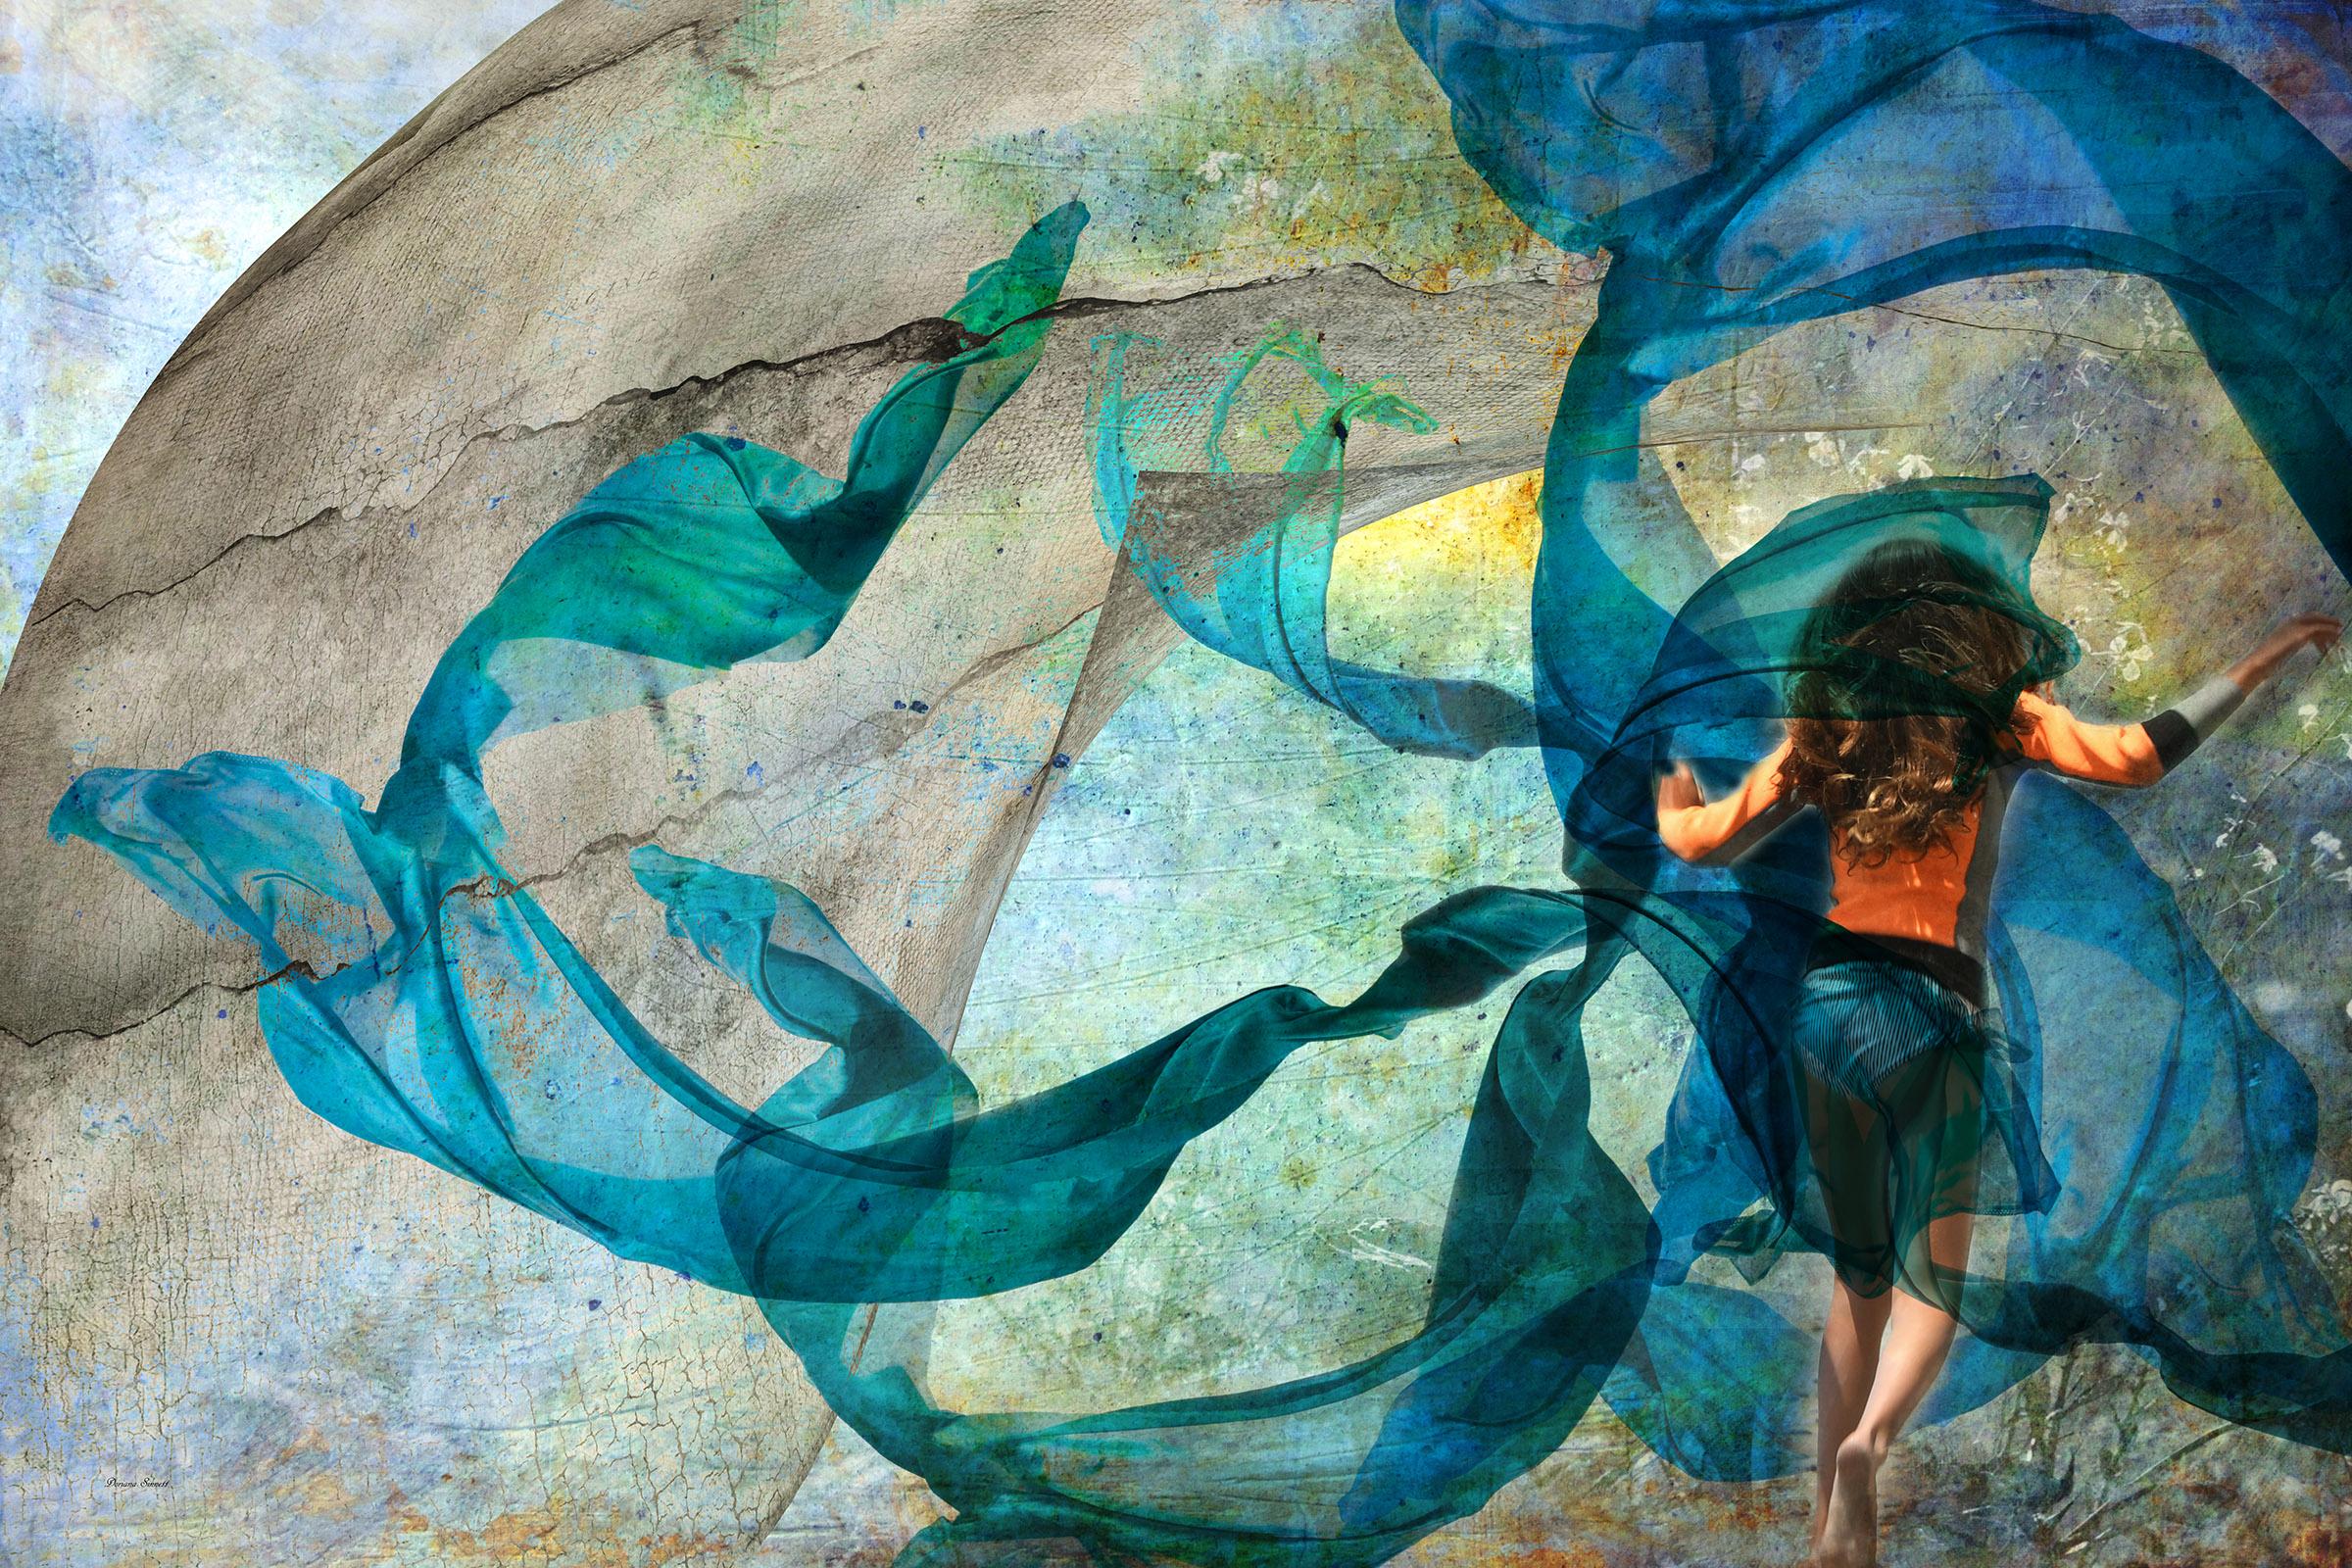 Chasing The Wind…BUY  https://artboja.com/art/38vvy2/17591.php